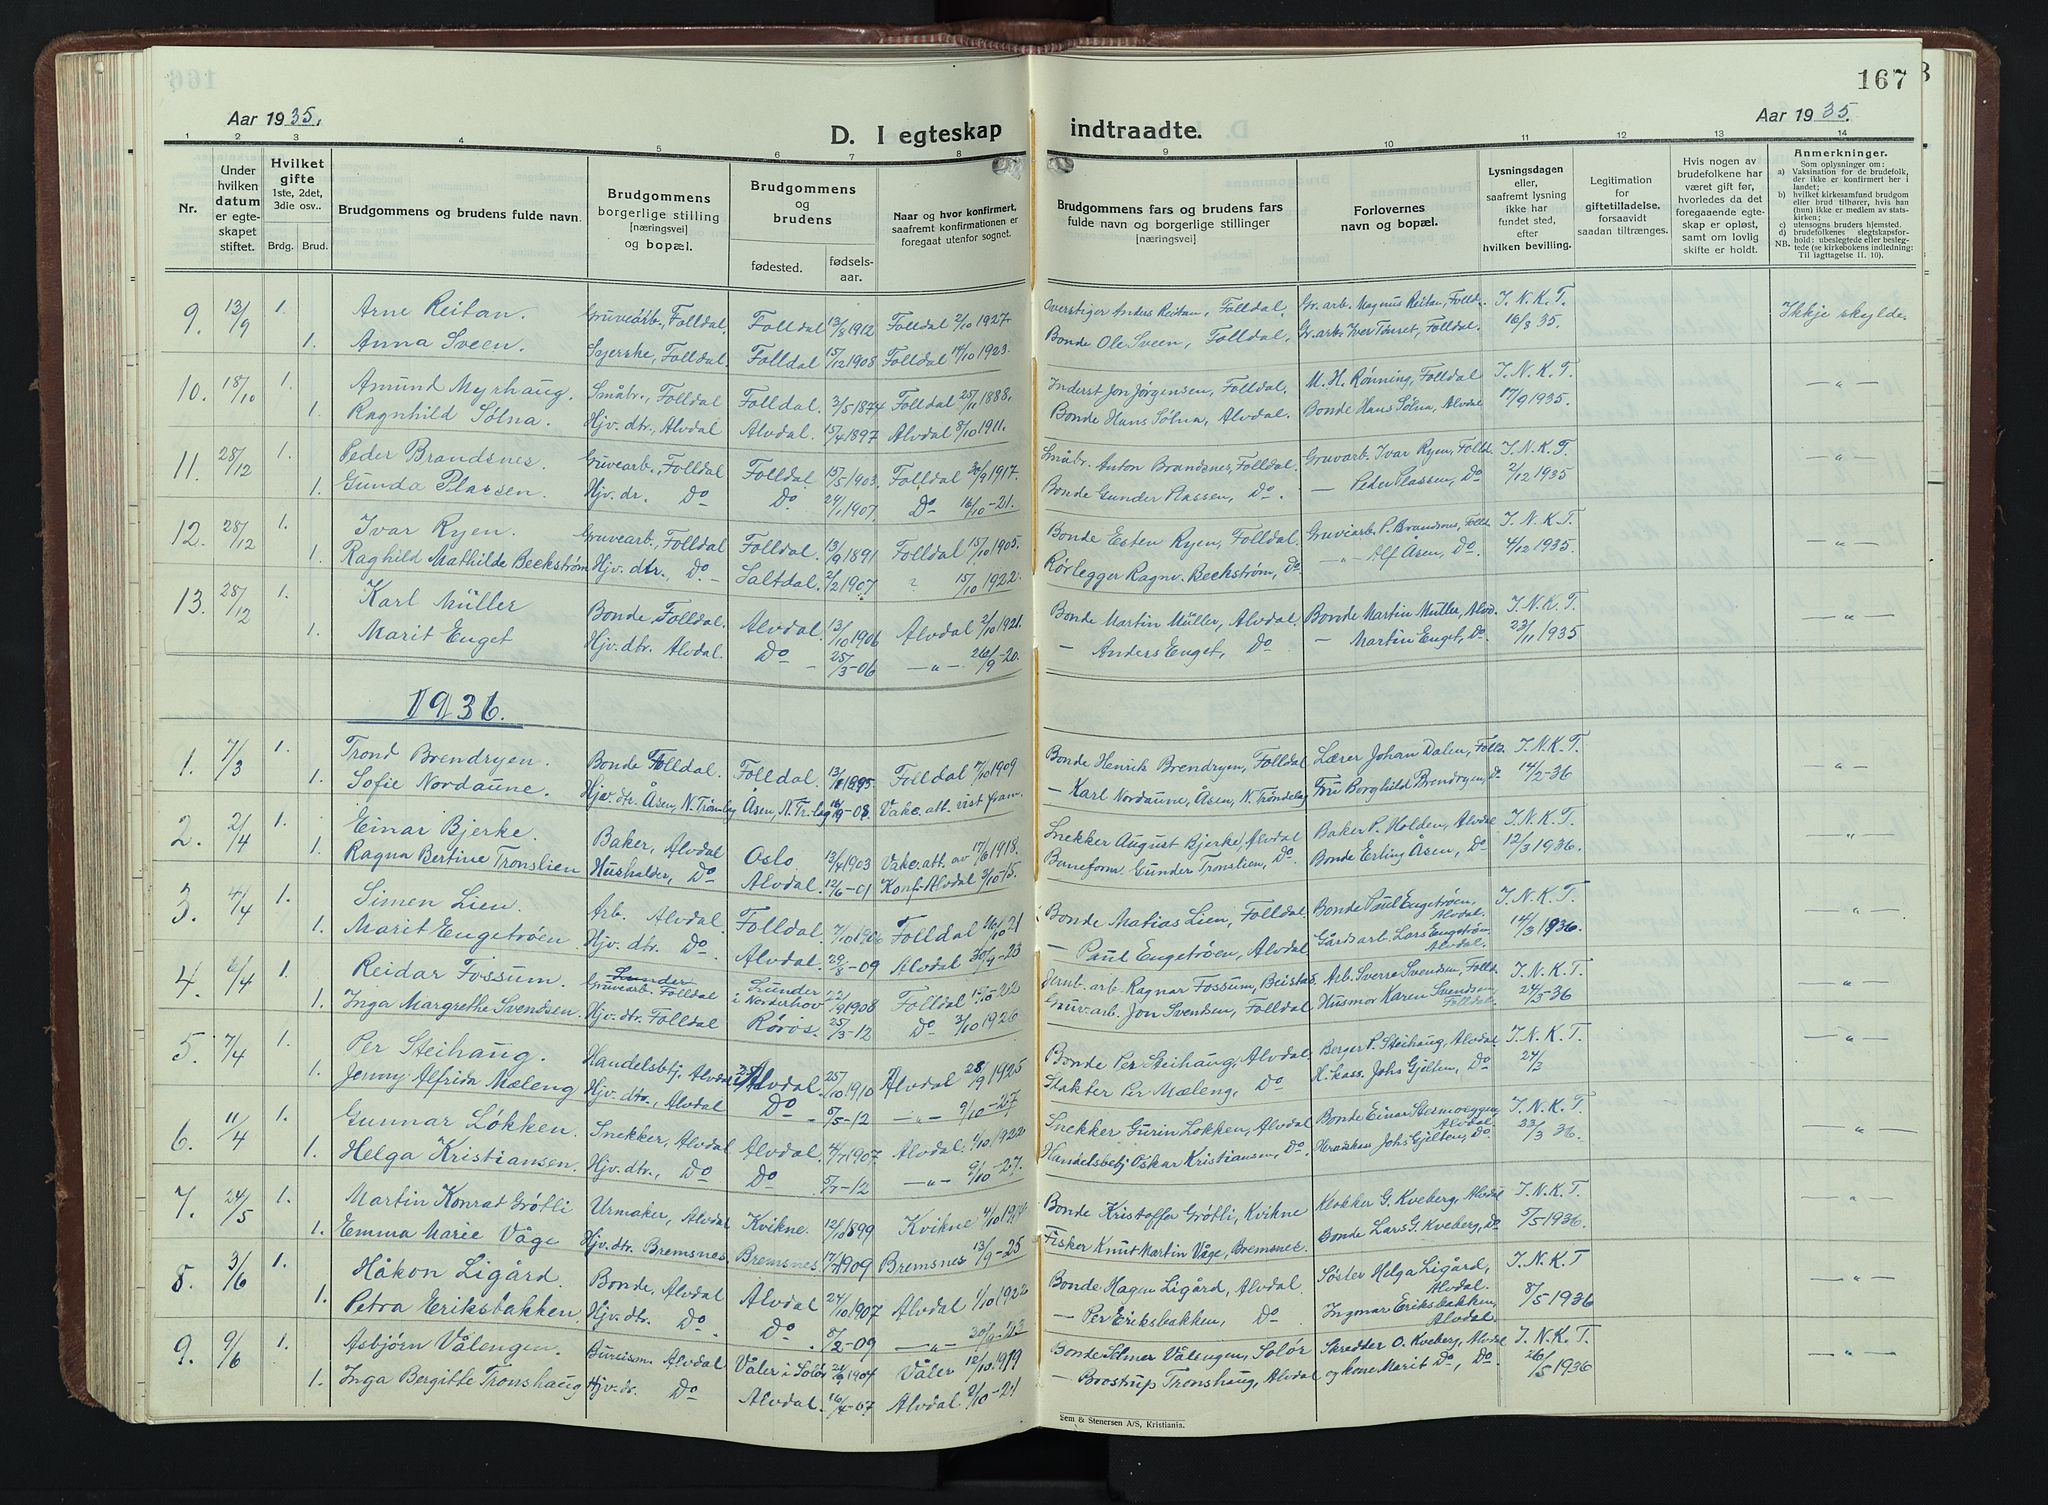 SAH, Alvdal prestekontor, Klokkerbok nr. 7, 1924-1945, s. 167